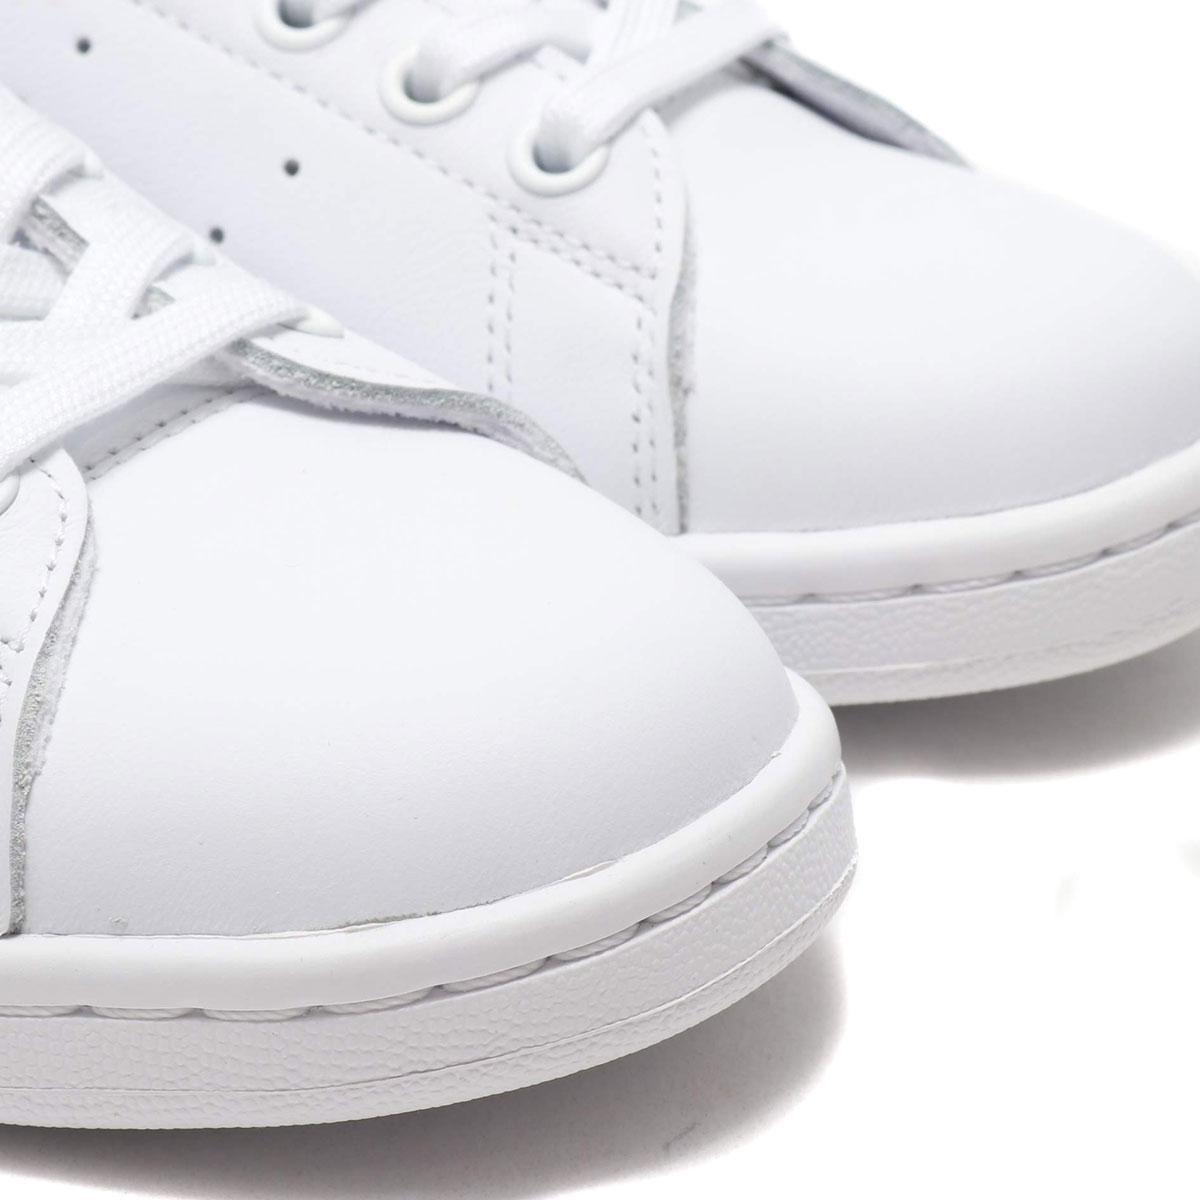 adidas Originals STAN SMITH W (アディダスオリジナルス スタンスミス W)FTWR WHITE/SILVER MET./CLEAR MINT【レディース スニーカー】19SS-I